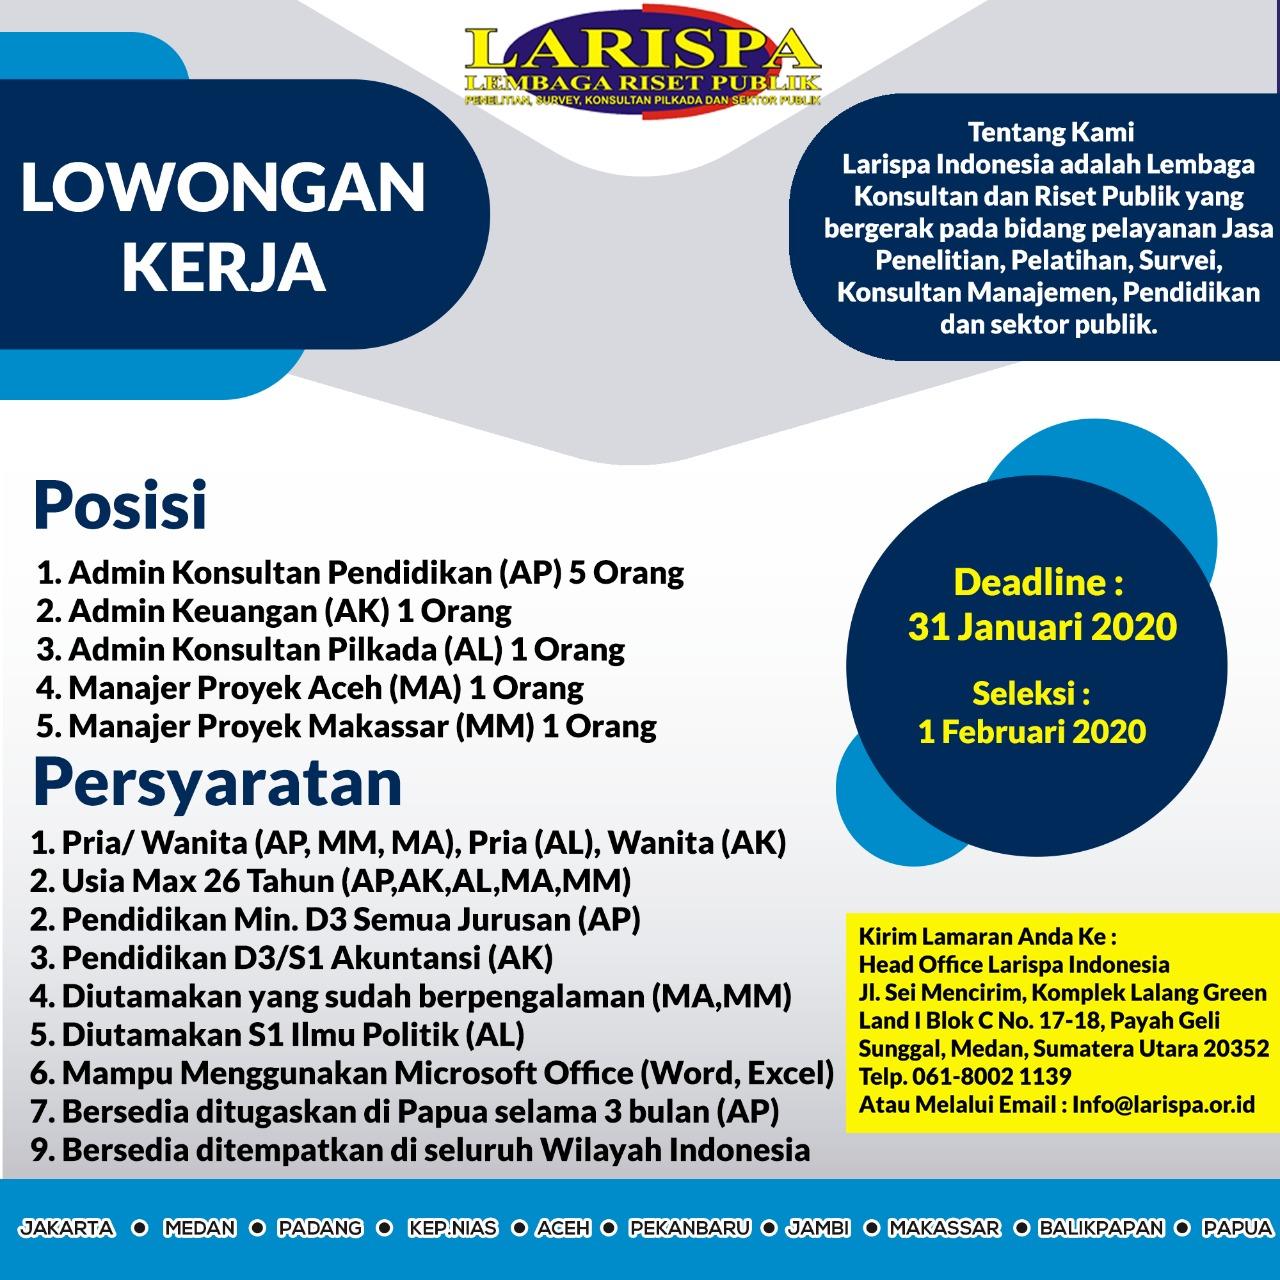 Lowongan Kerja Larispa Indonesia Januari 2020 Larispa Lembaga